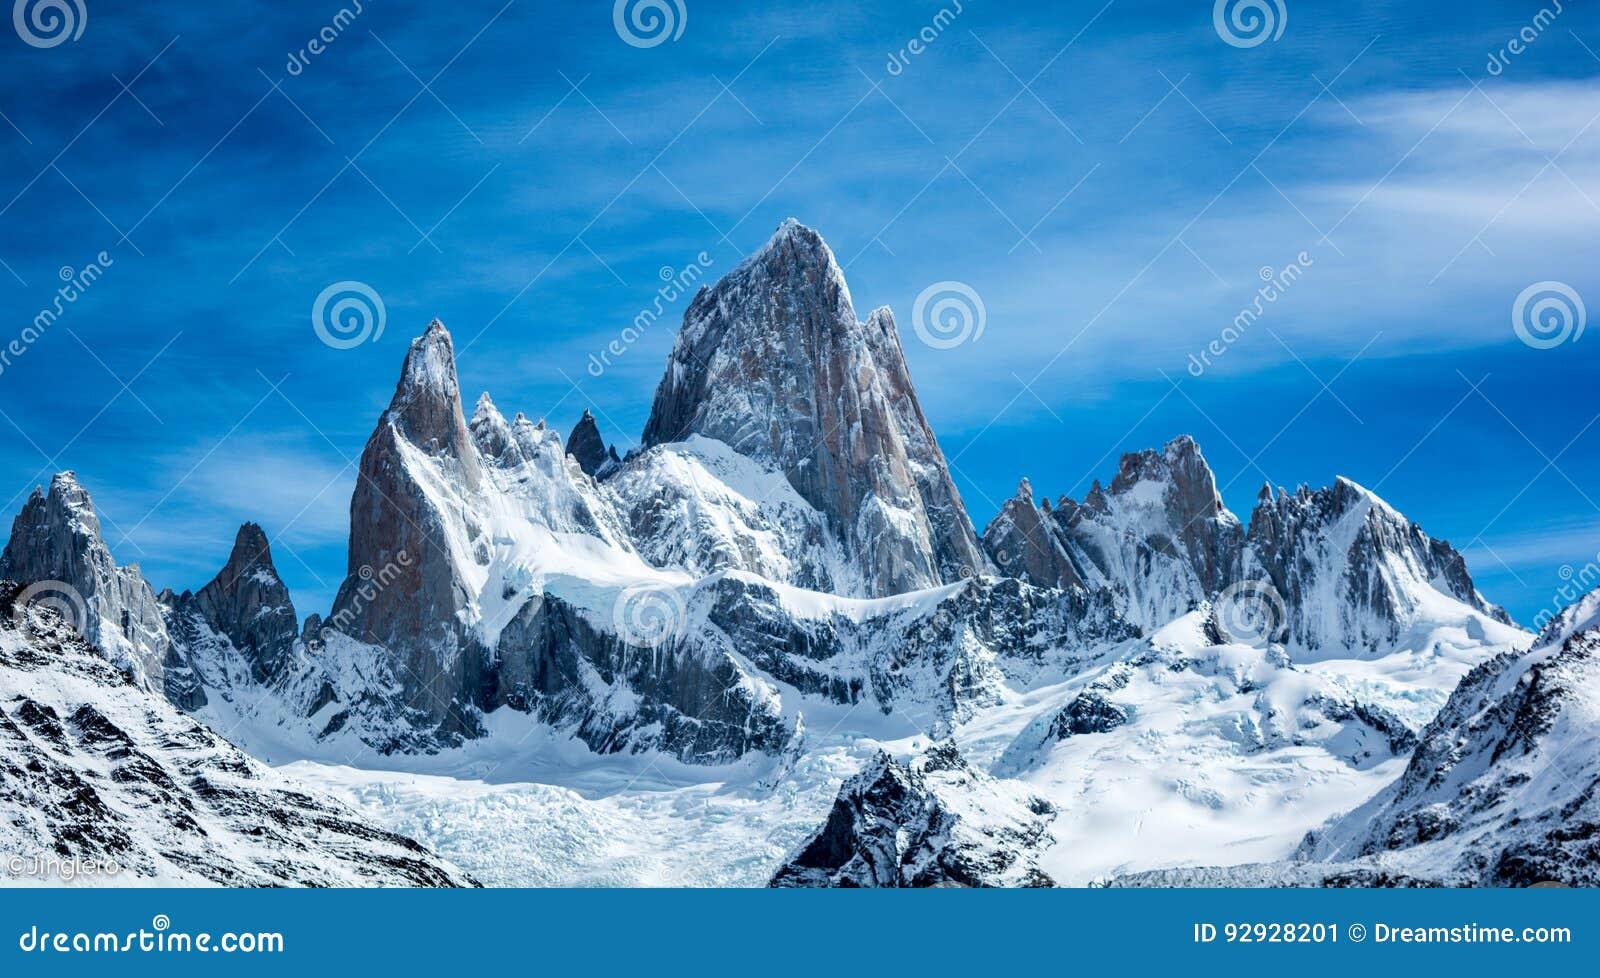 Montering Fitz Roy, El Chaltén, Santa Cruz, Patagonia, Argentina